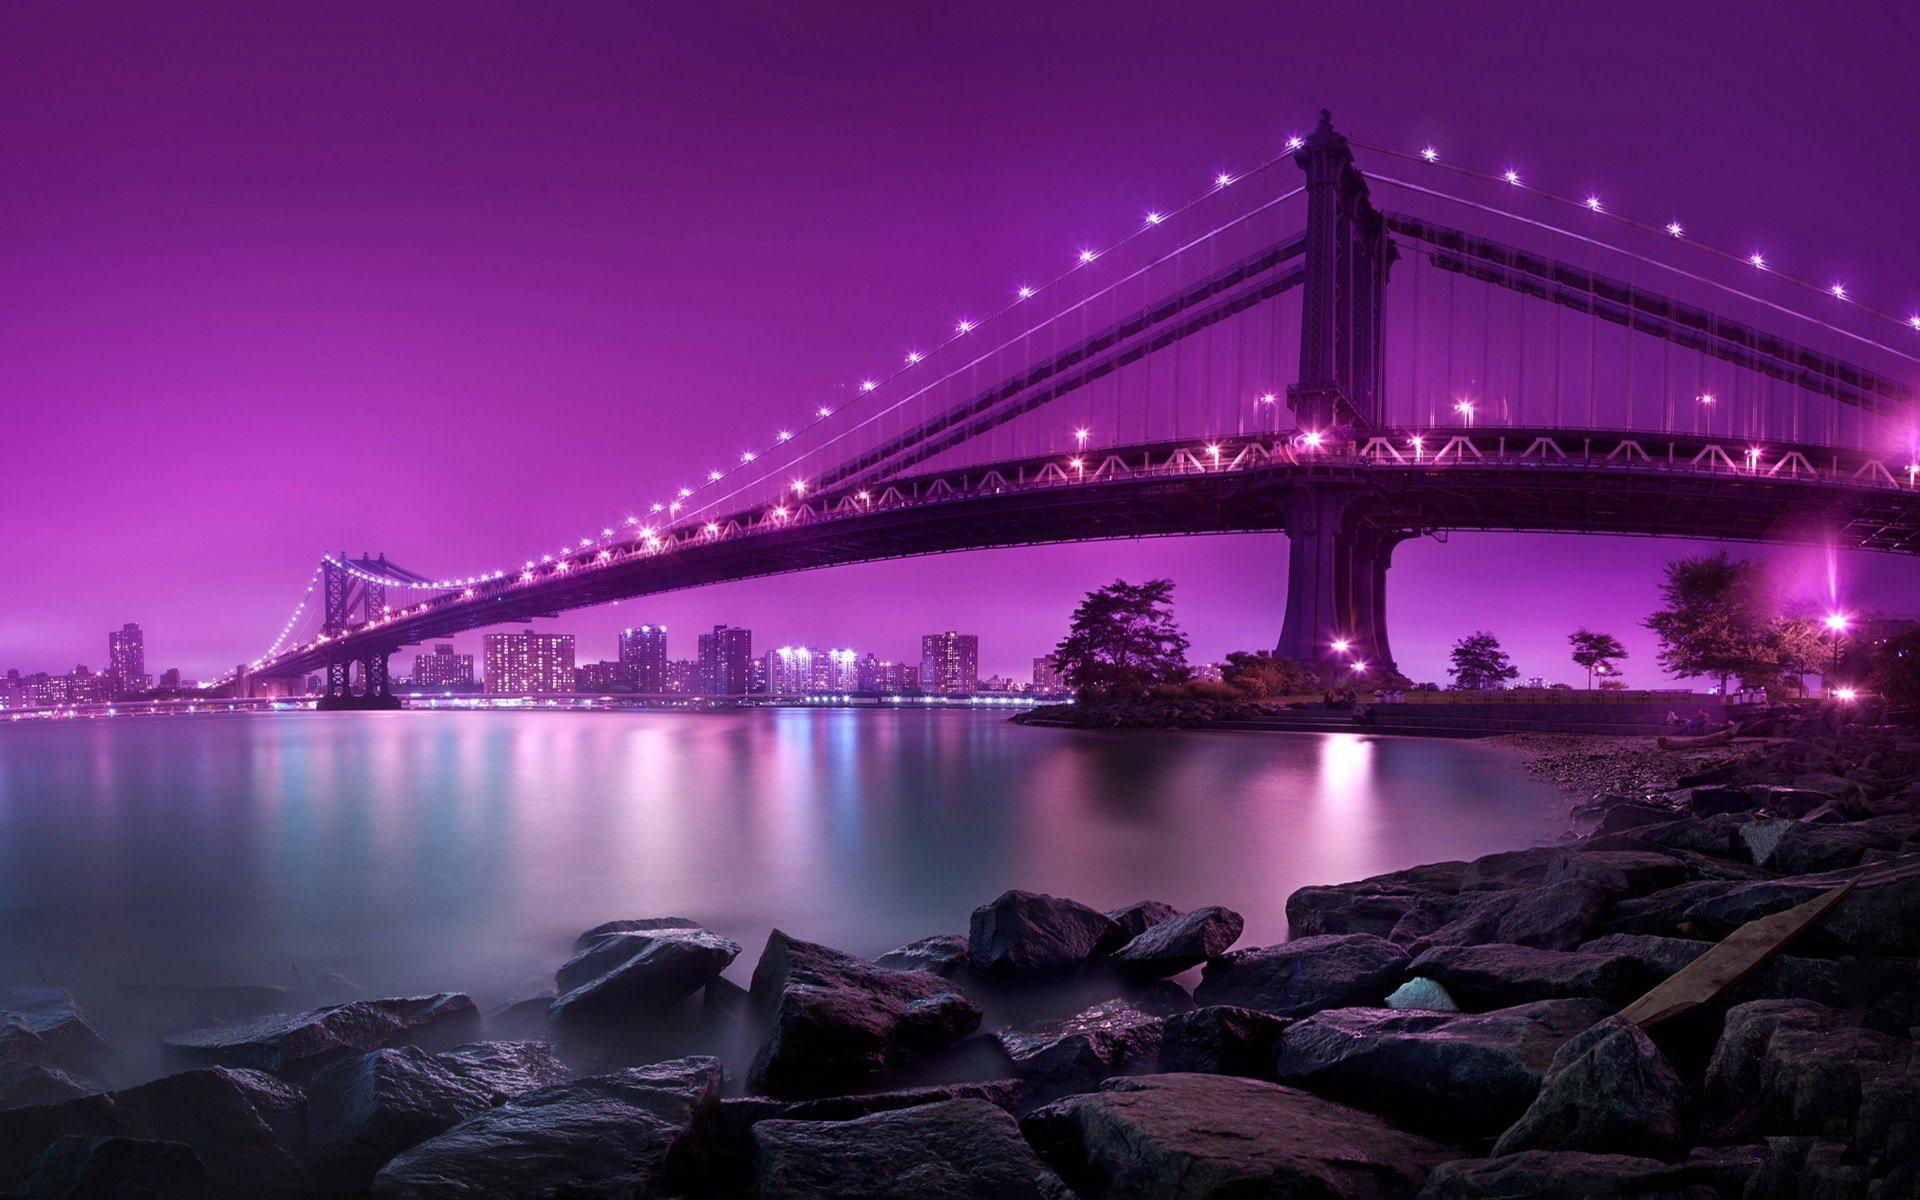 light bridge wallpaper - photo #22